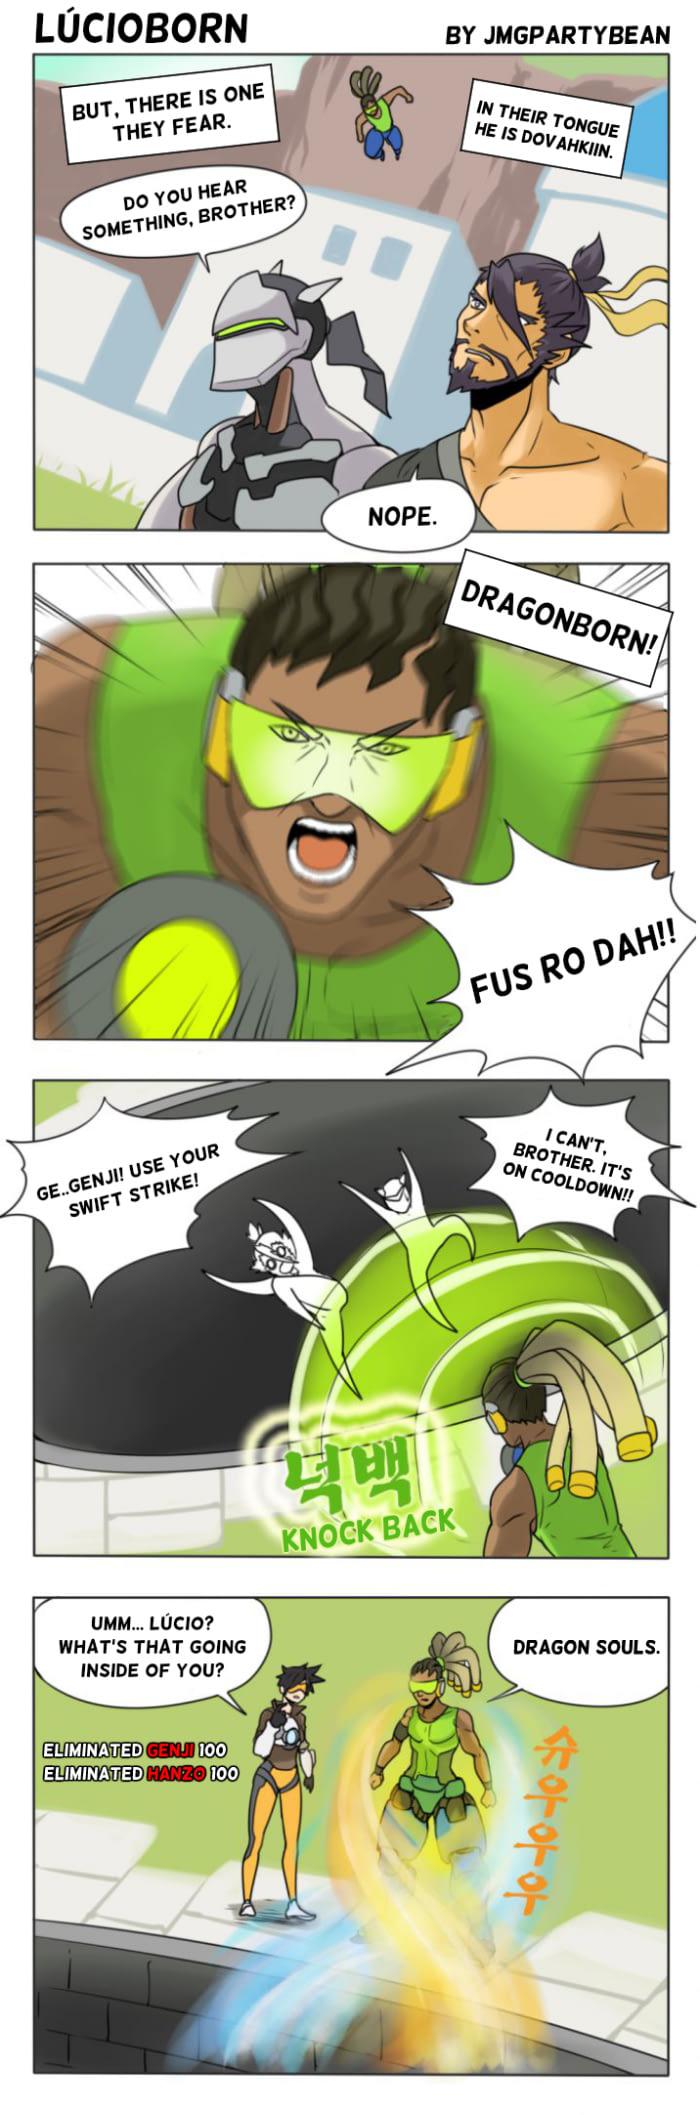 Mada Mada Overwatch Overwatch Funny Overwatch Comic Valorant vs overwatch | group up! mada mada overwatch overwatch funny